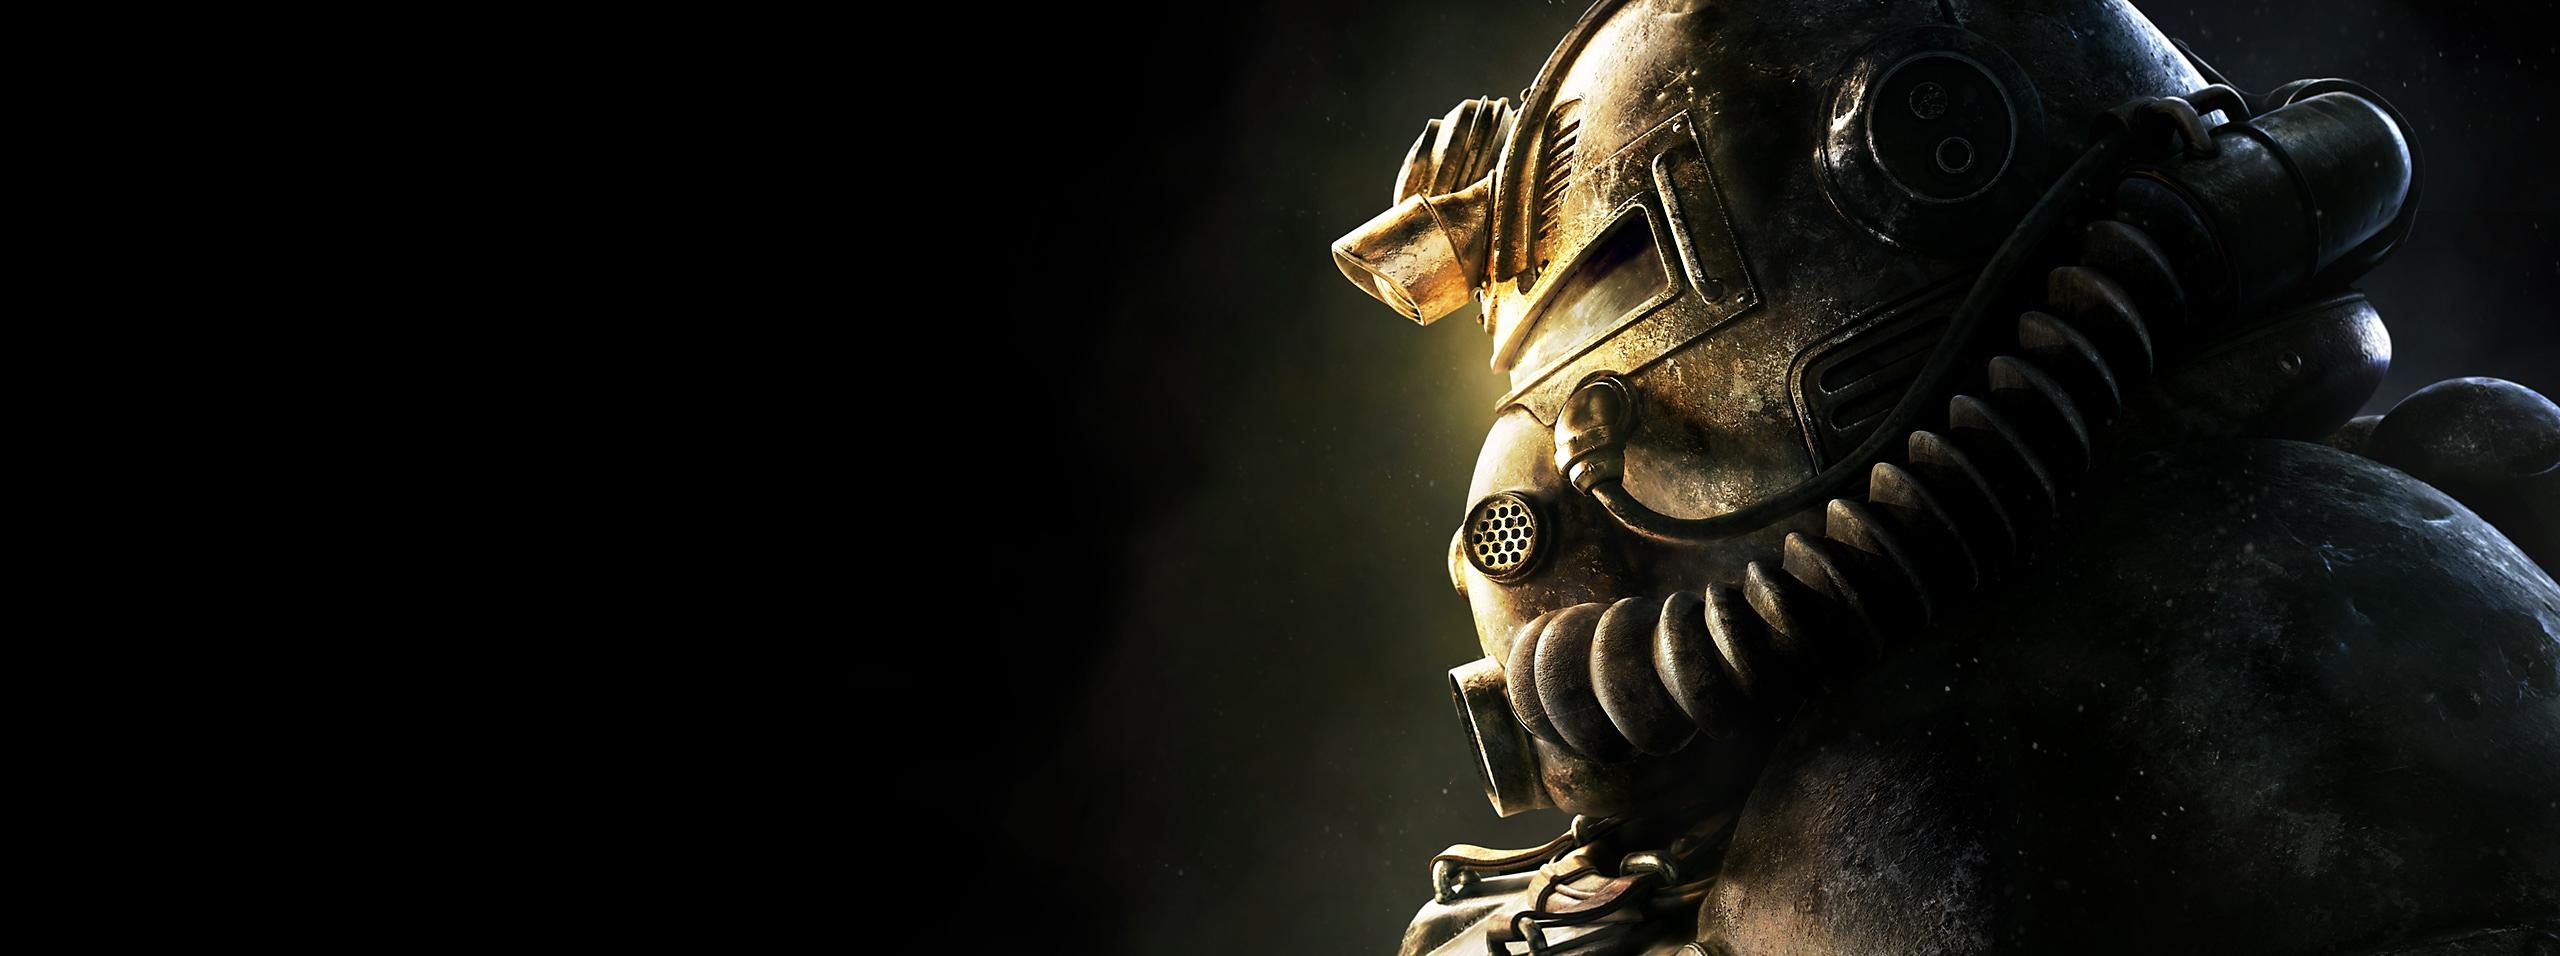 Fallout 76 hero art